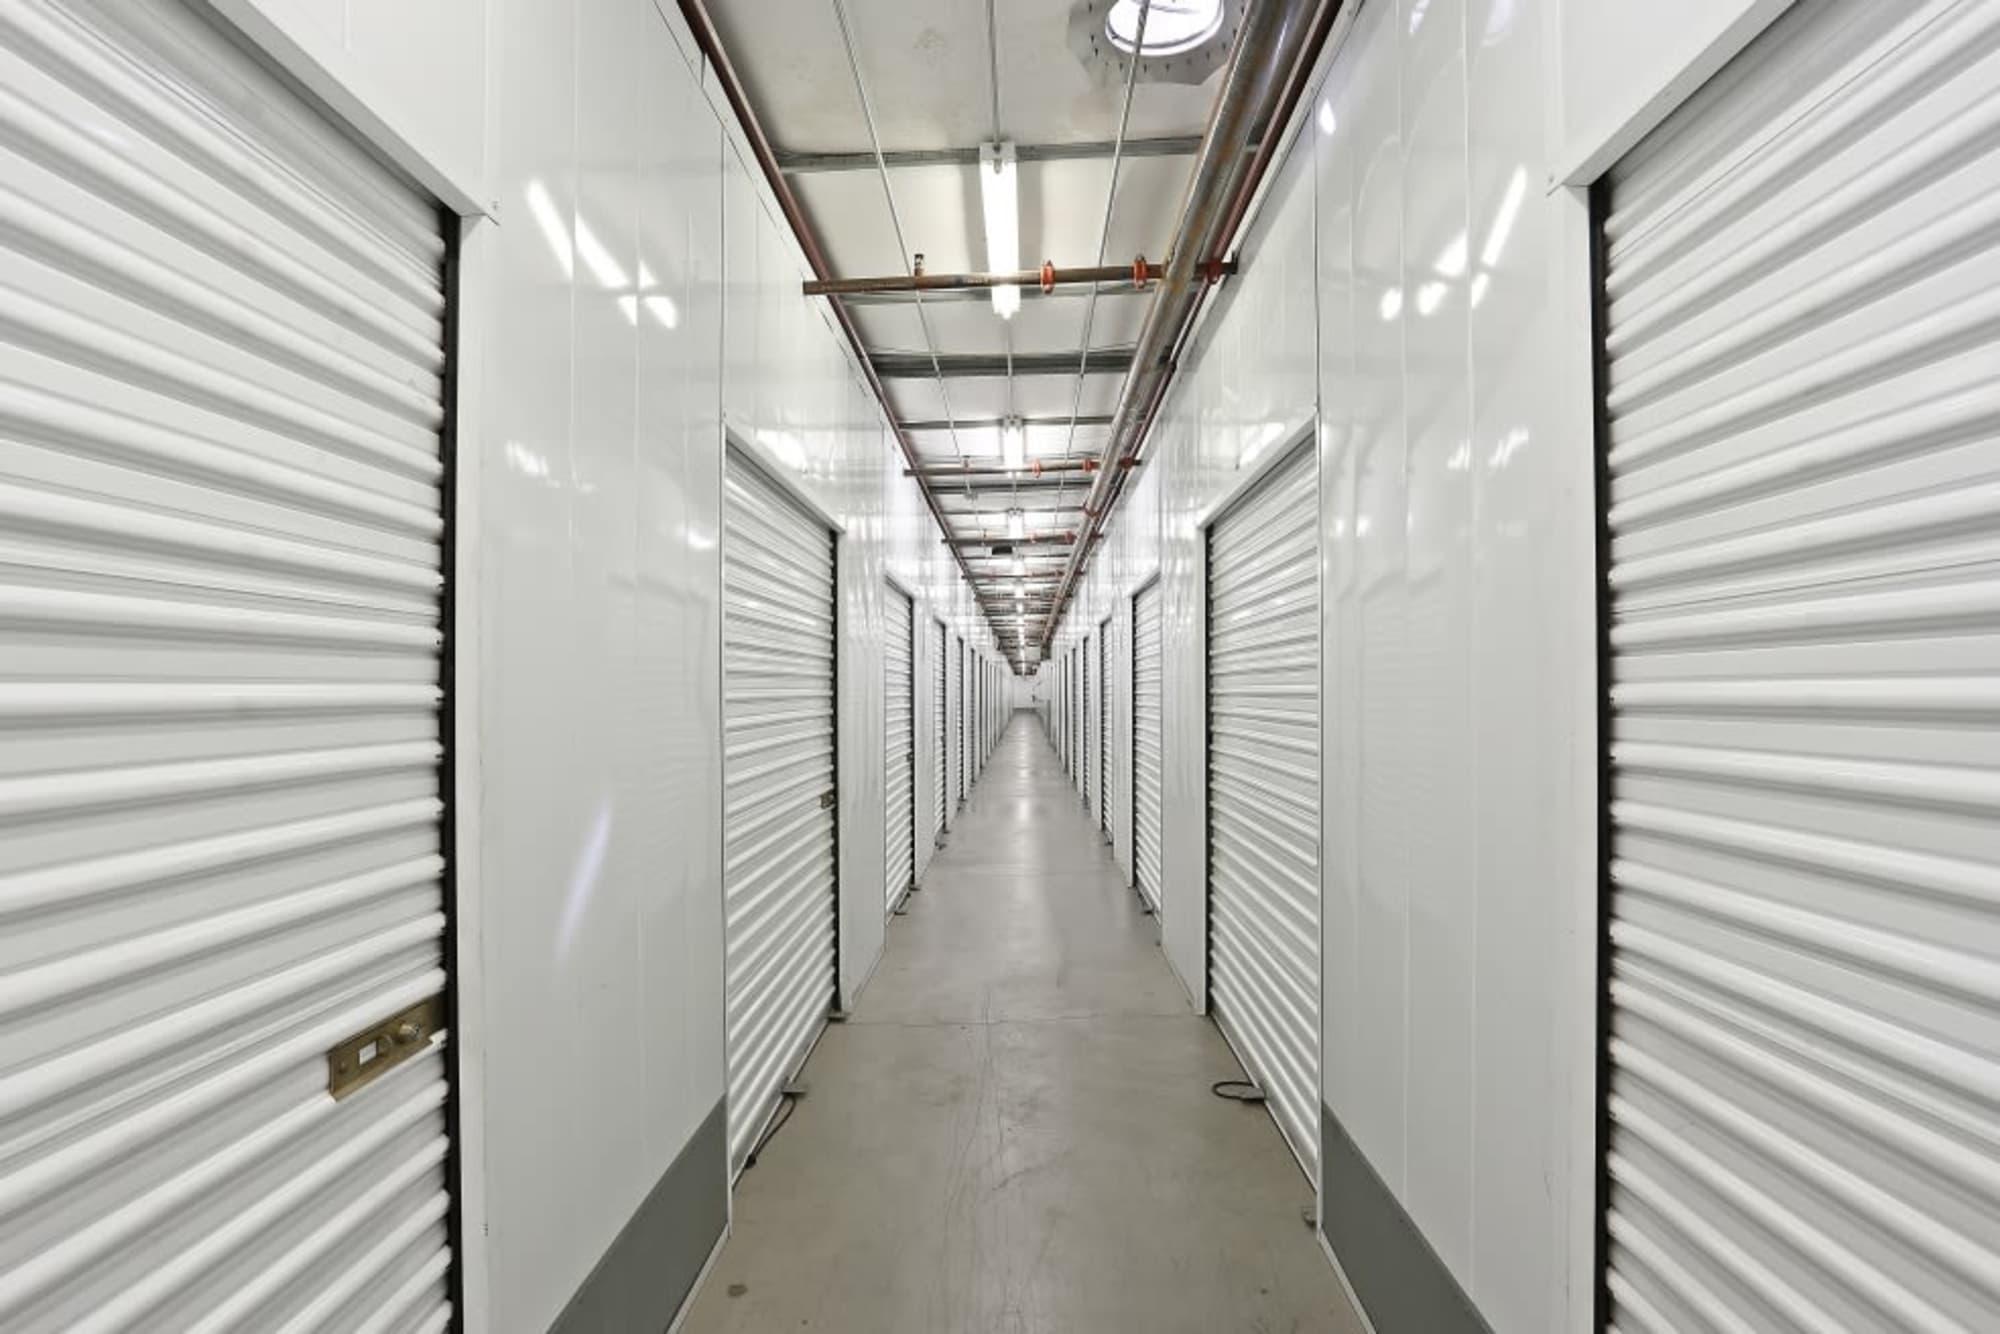 Indoor storage units at A-1 Self Storage in La Mesa, California